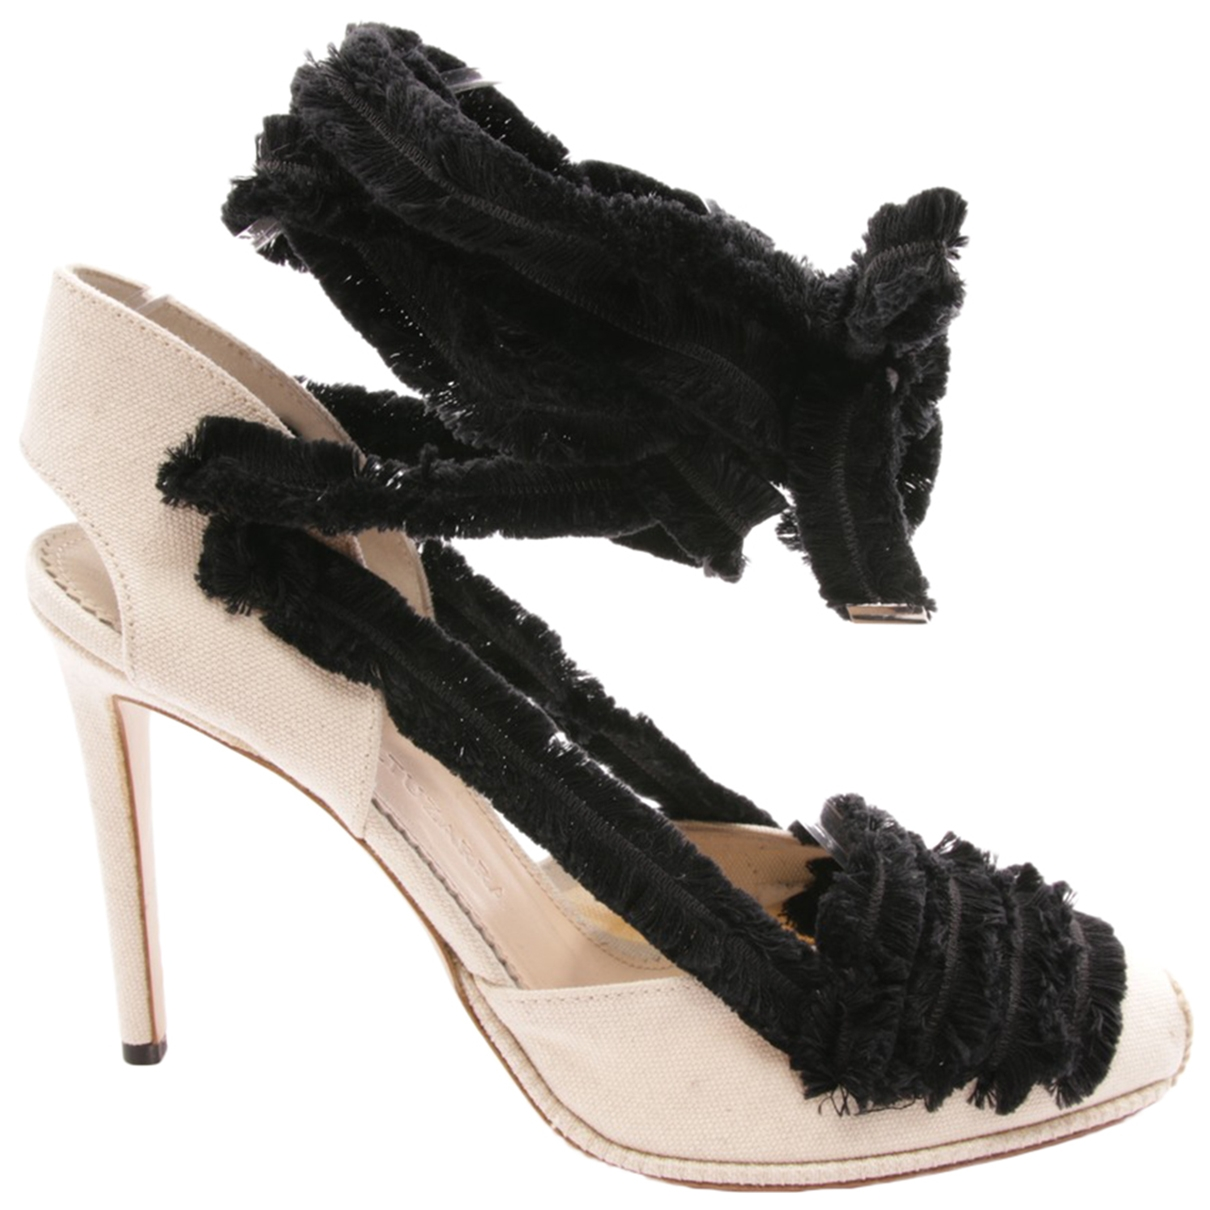 Altuzarra \N Beige Leather Sandals for Women 41 EU